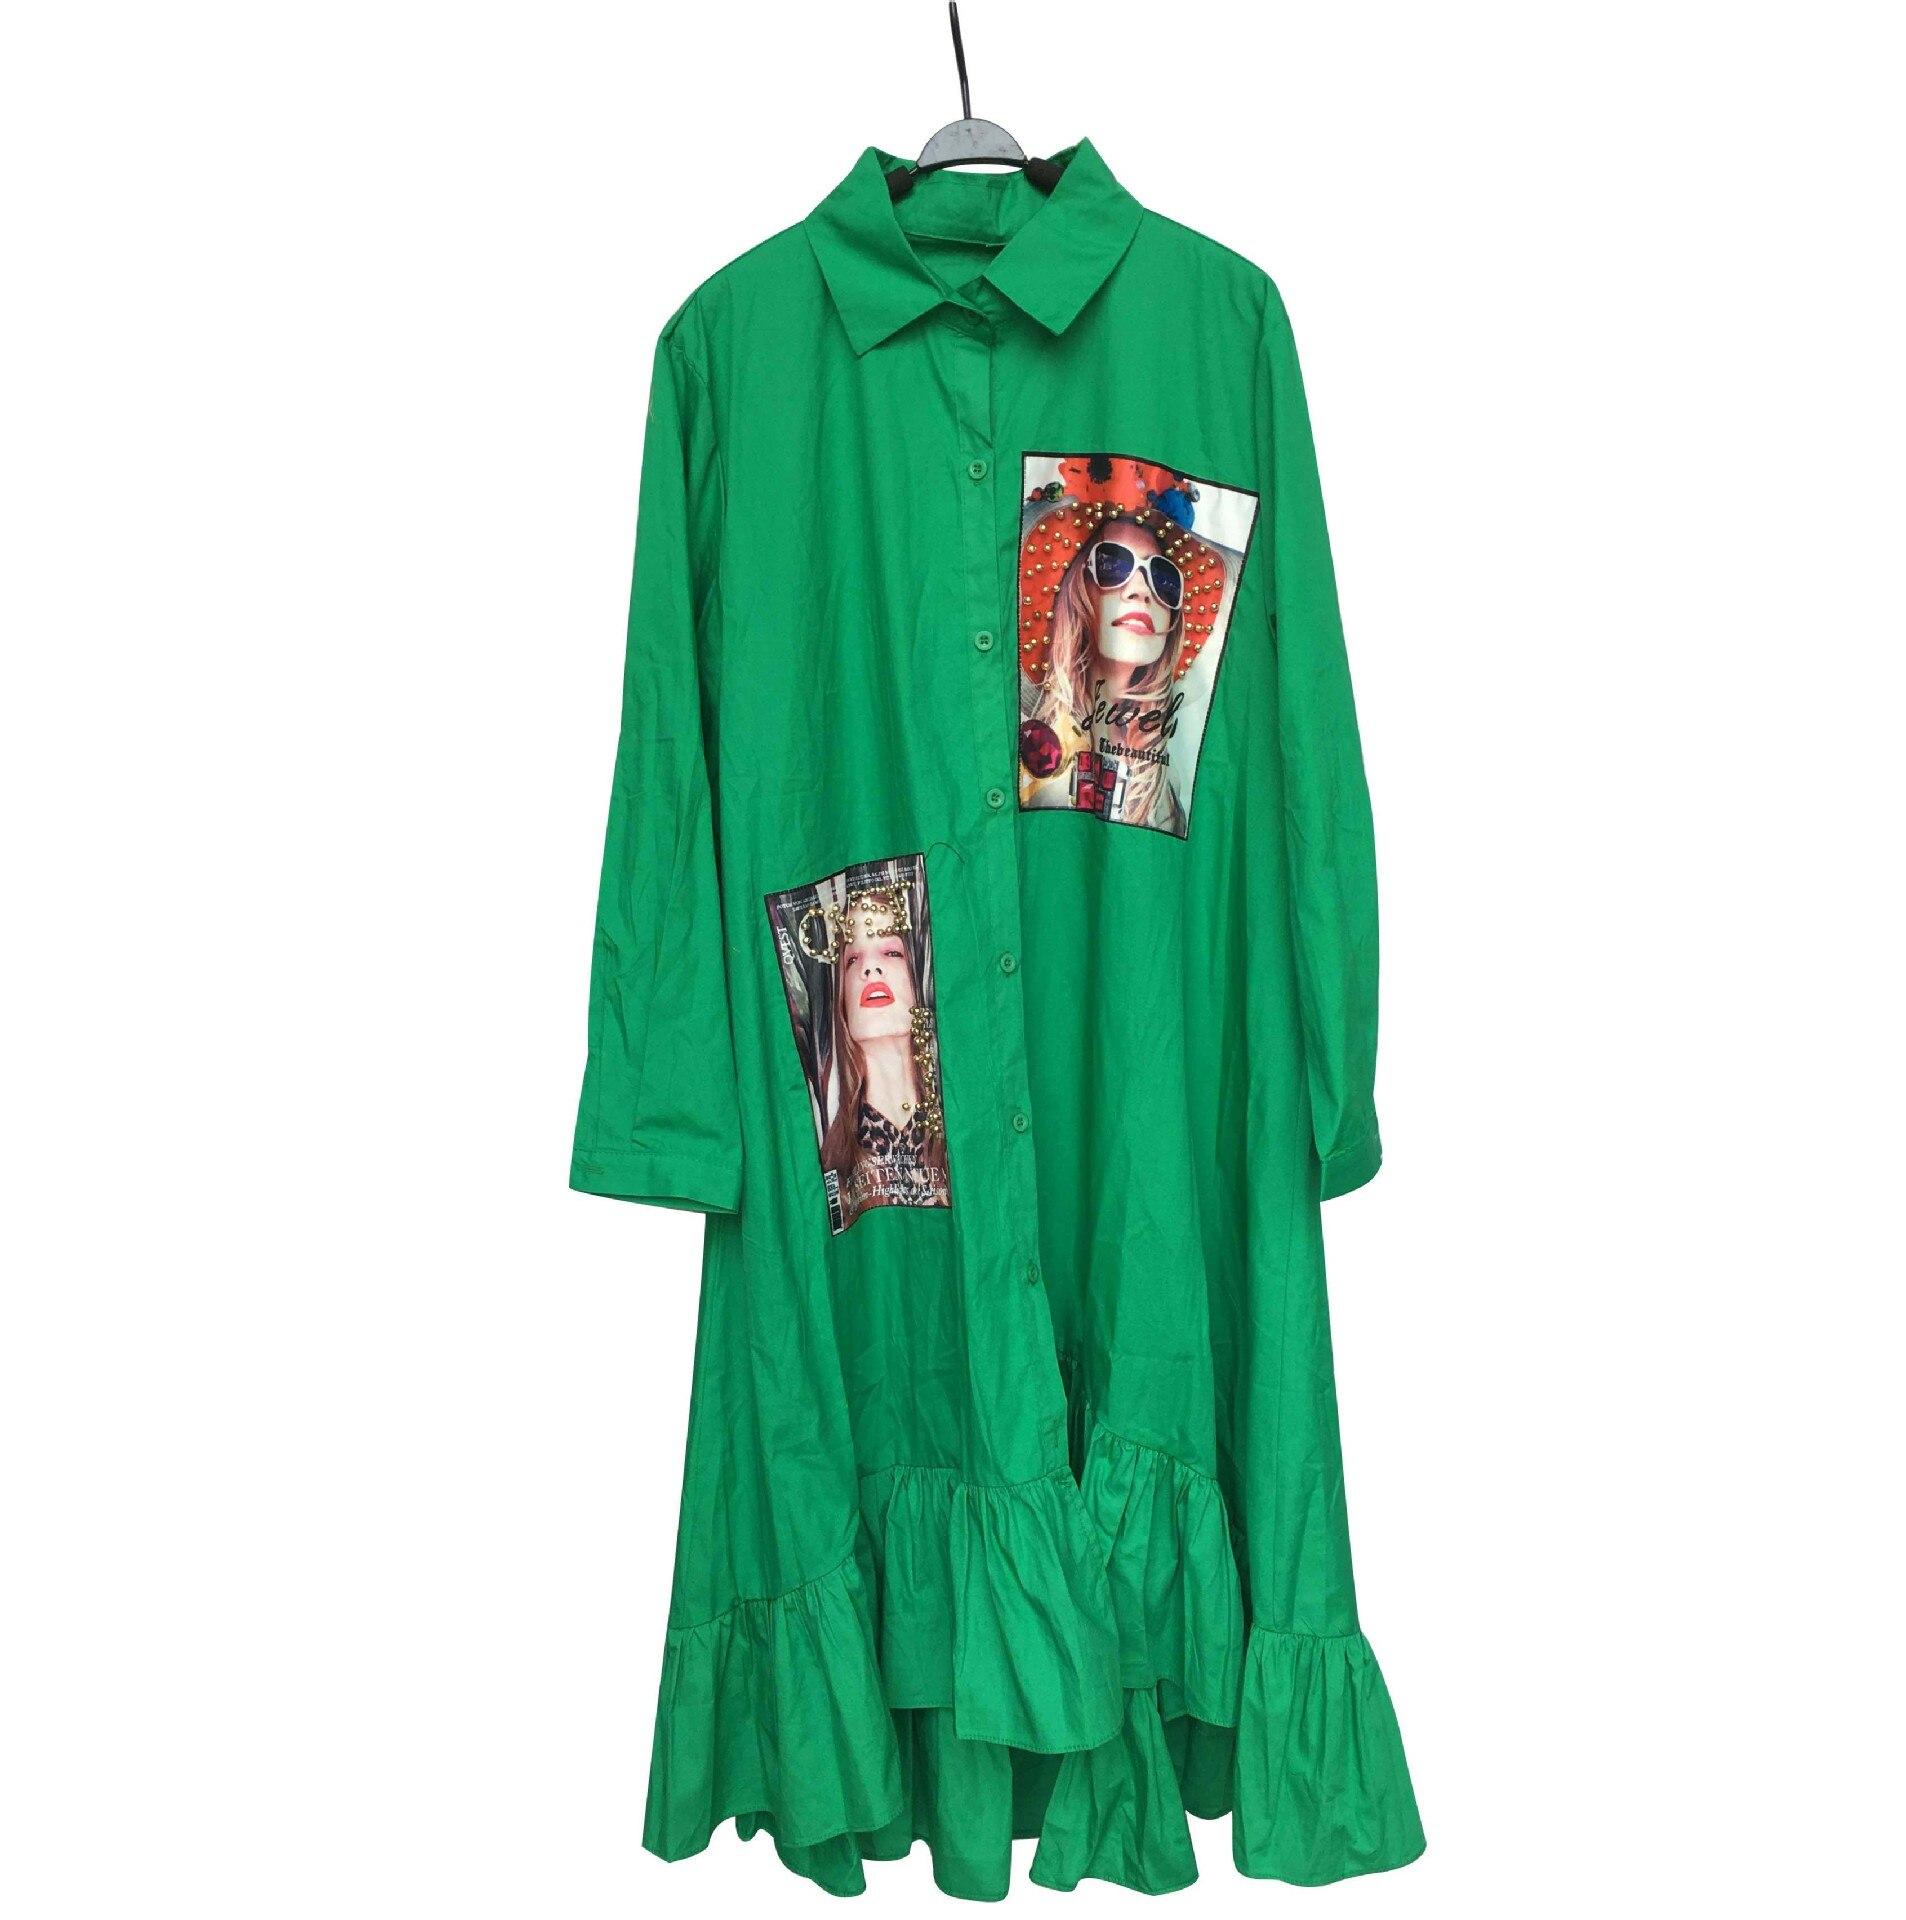 Women Spring Autumn Fashion Green Yellow Pleated Dress 2020 Casual Cute Beading Shirt Dresses Long Sleeve Plus Size Vestidos 4